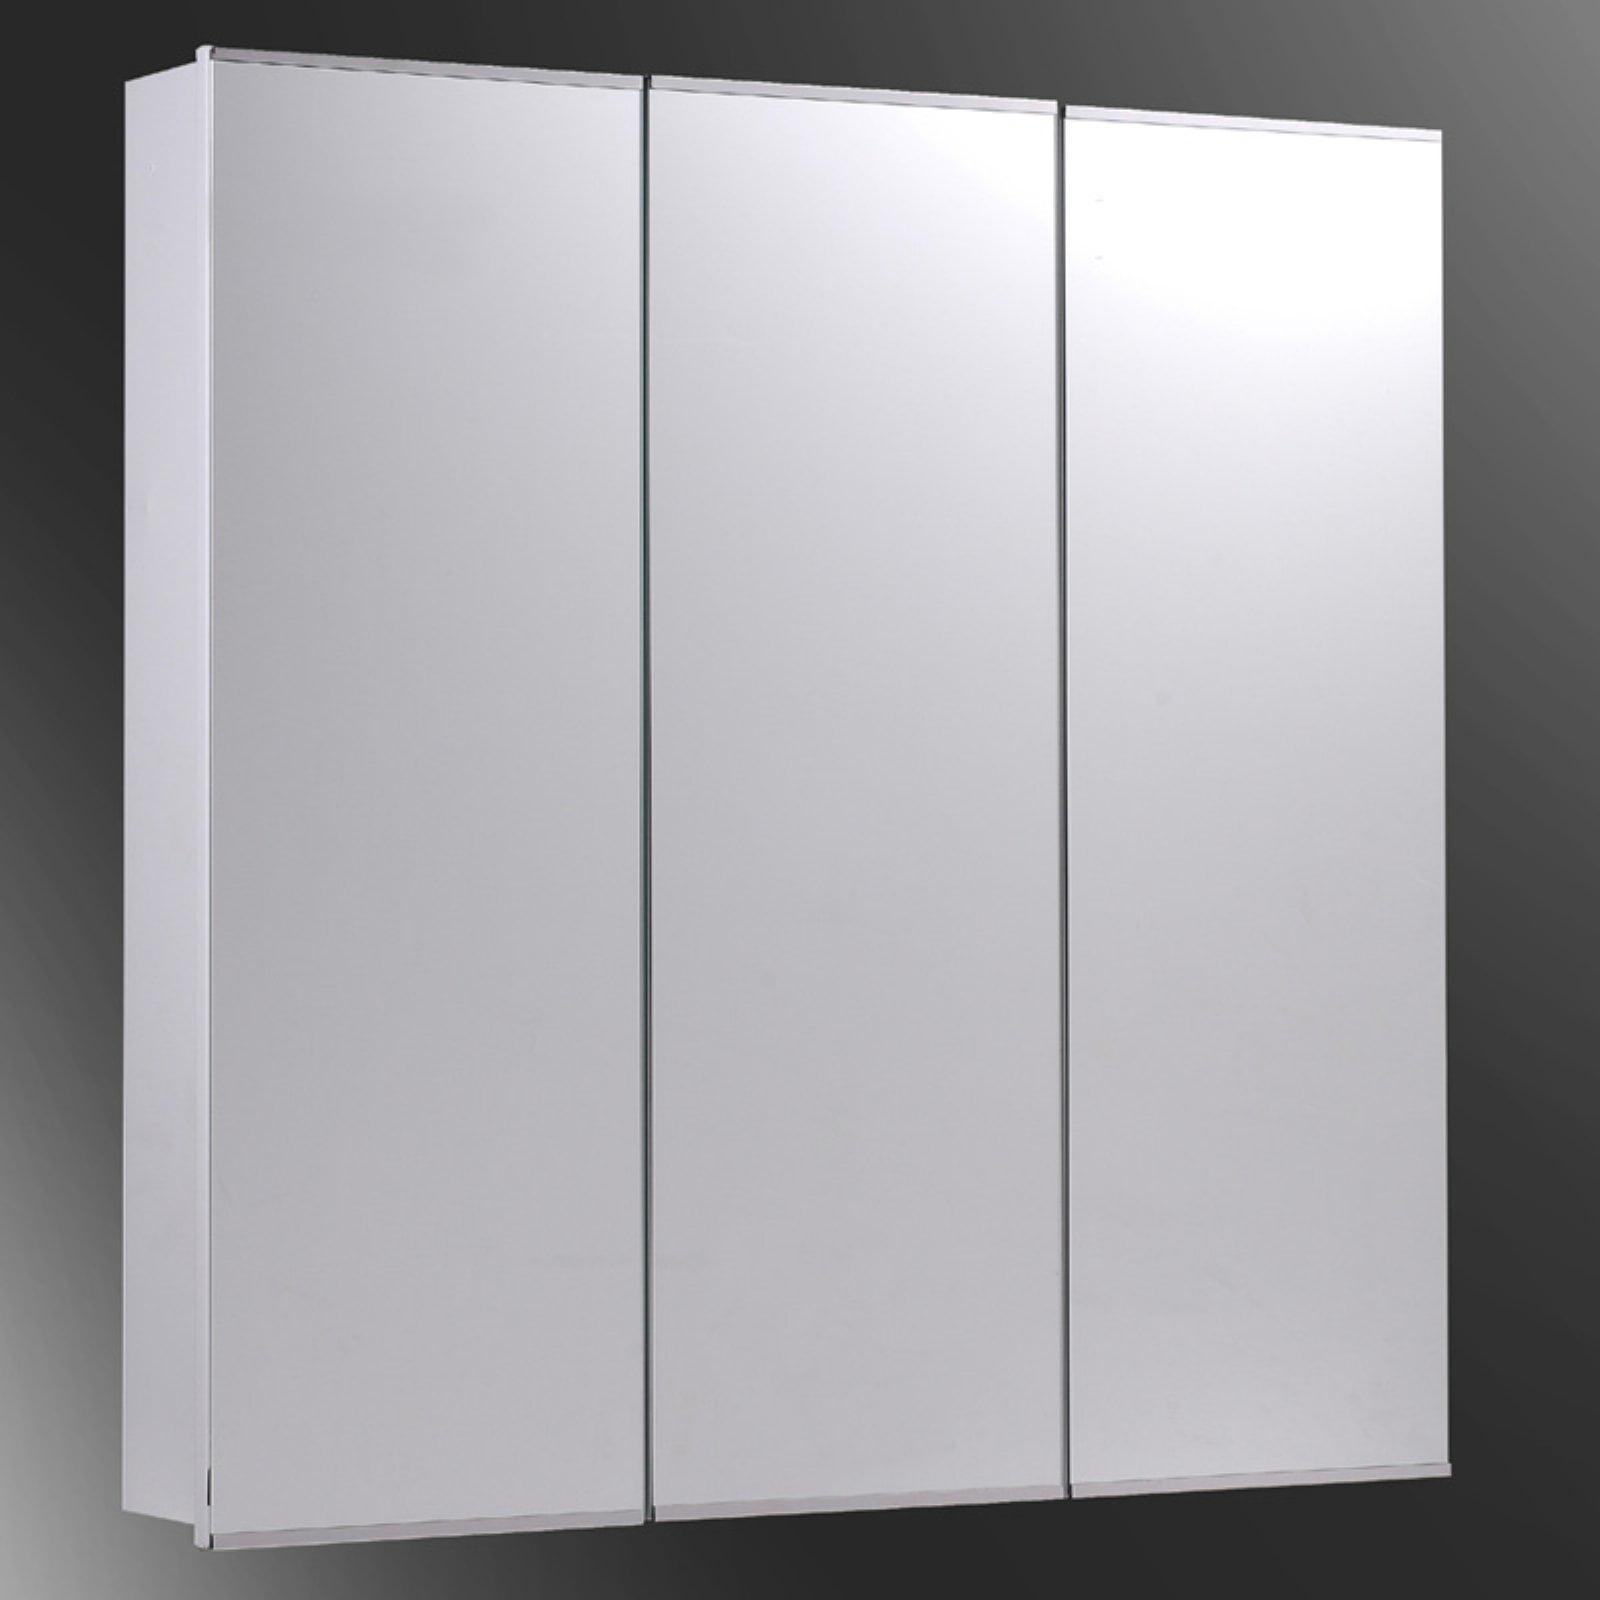 Ketcham 24W x 30H-in. Tri-View Recessed Medicine Cabinet by Ketcham Medicine Cabinets